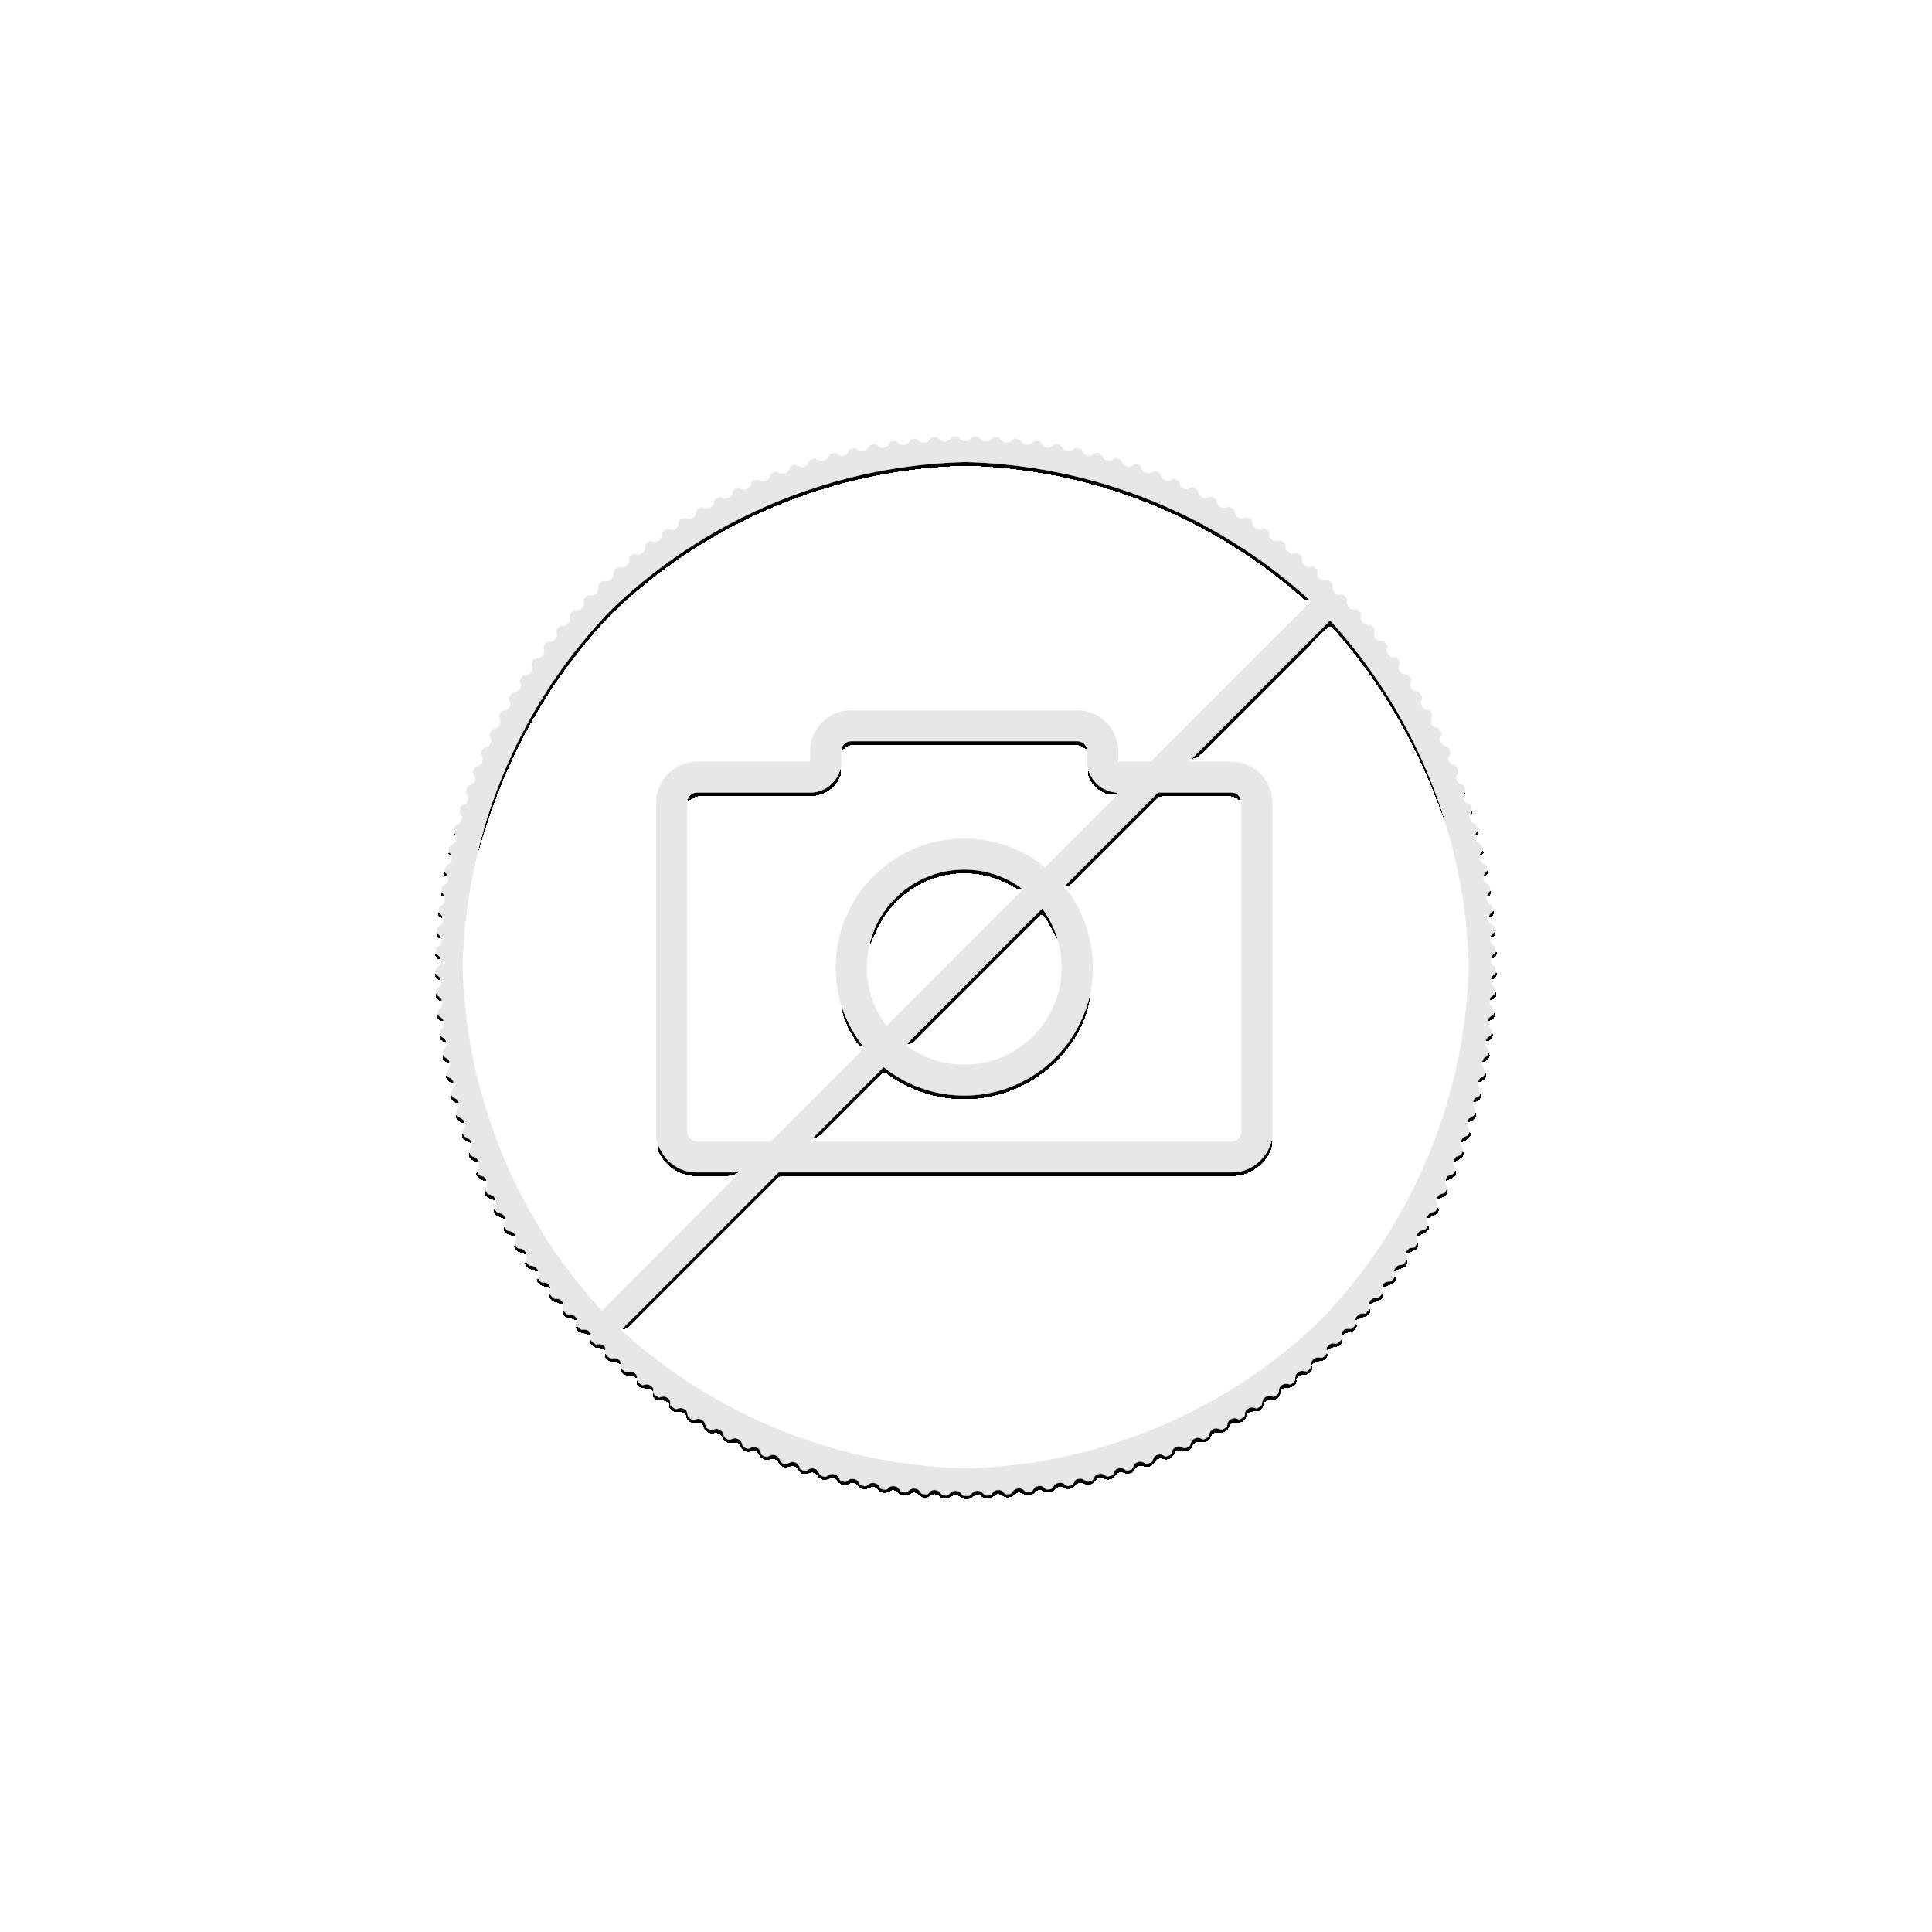 10 Sterling silver coins 5 Florin Aruba obverse